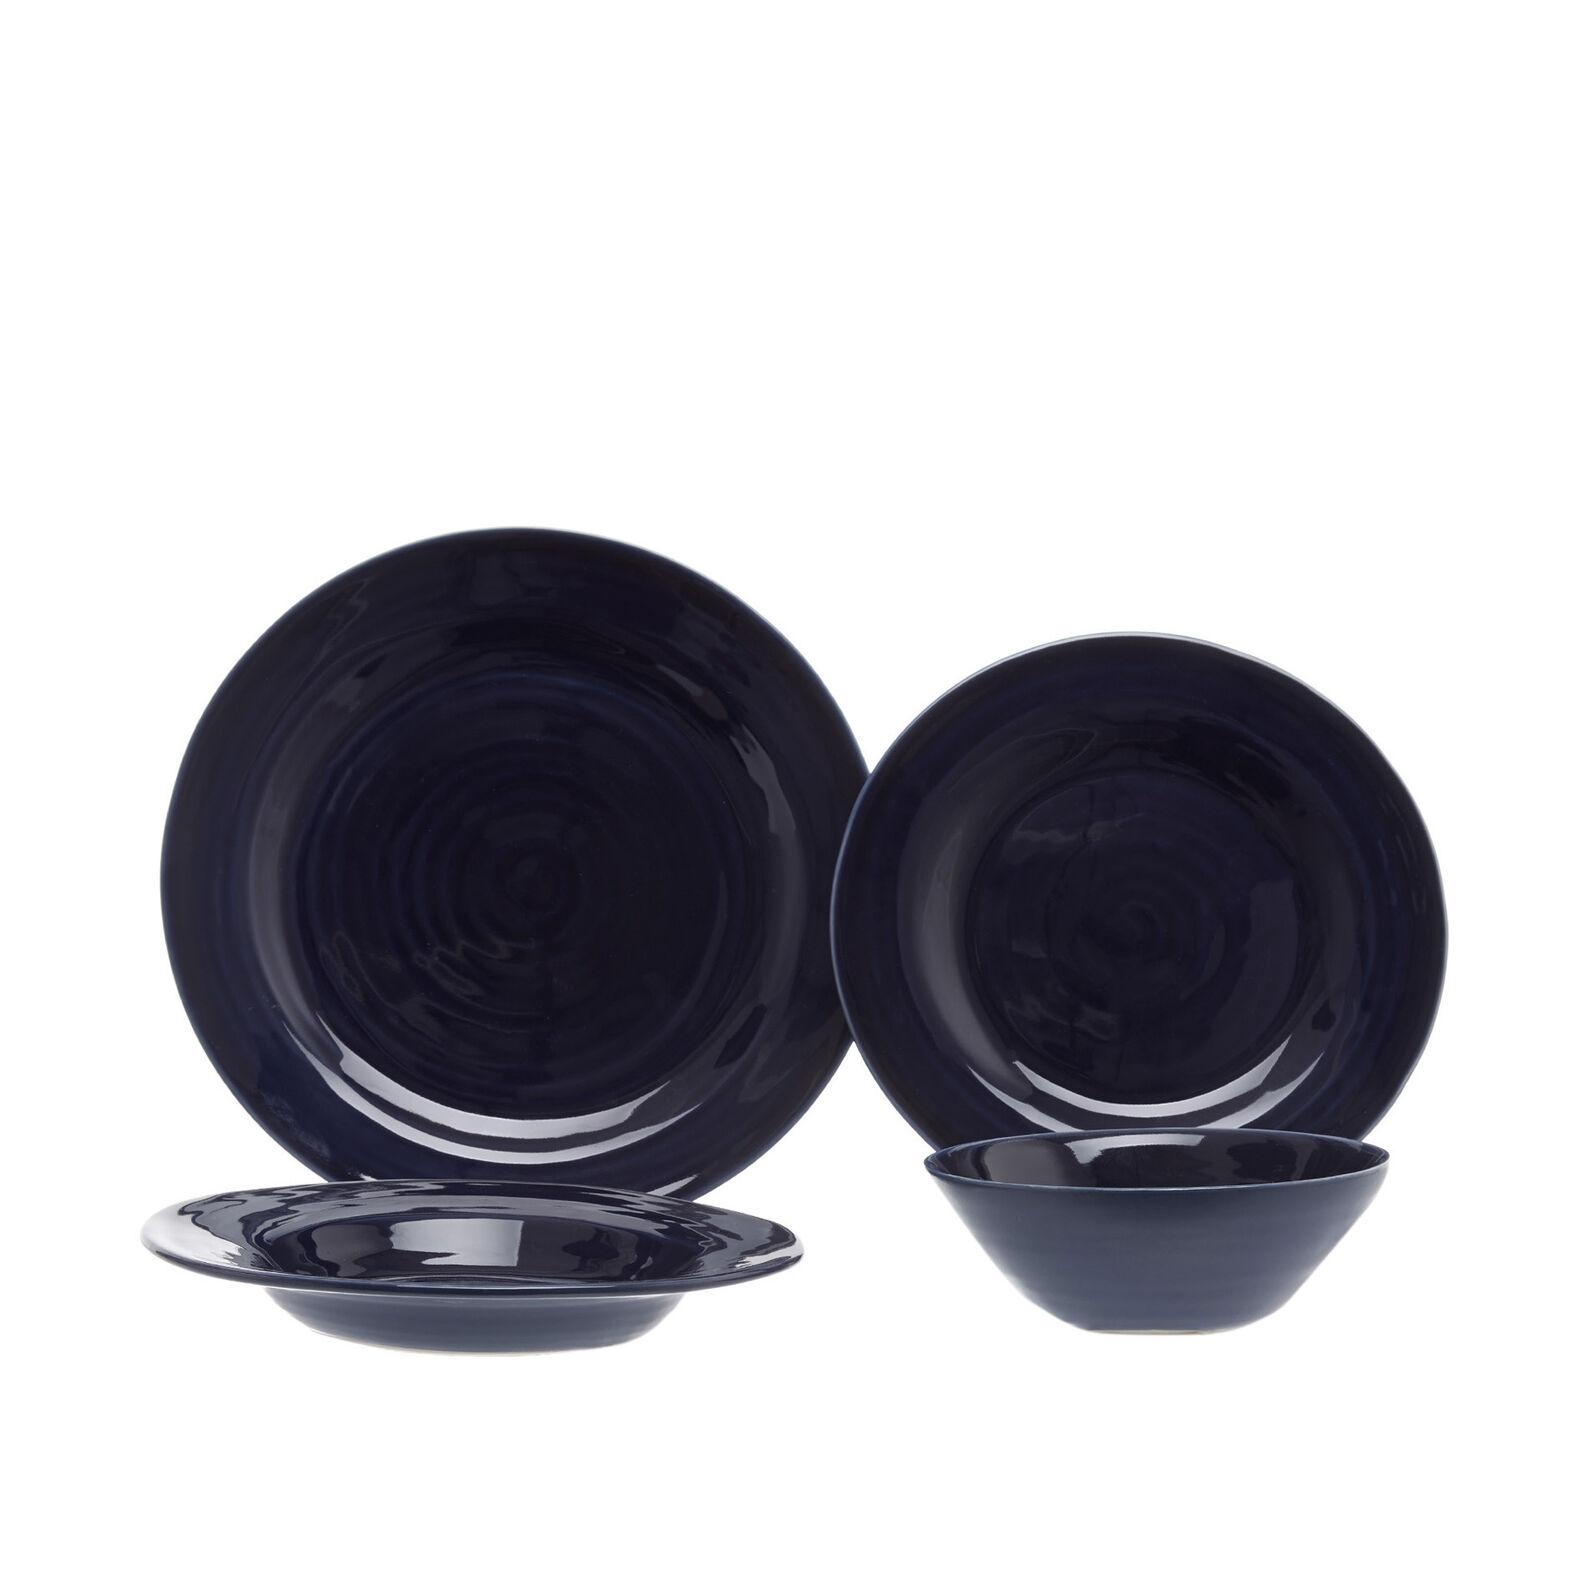 Astrid ceramic bowl